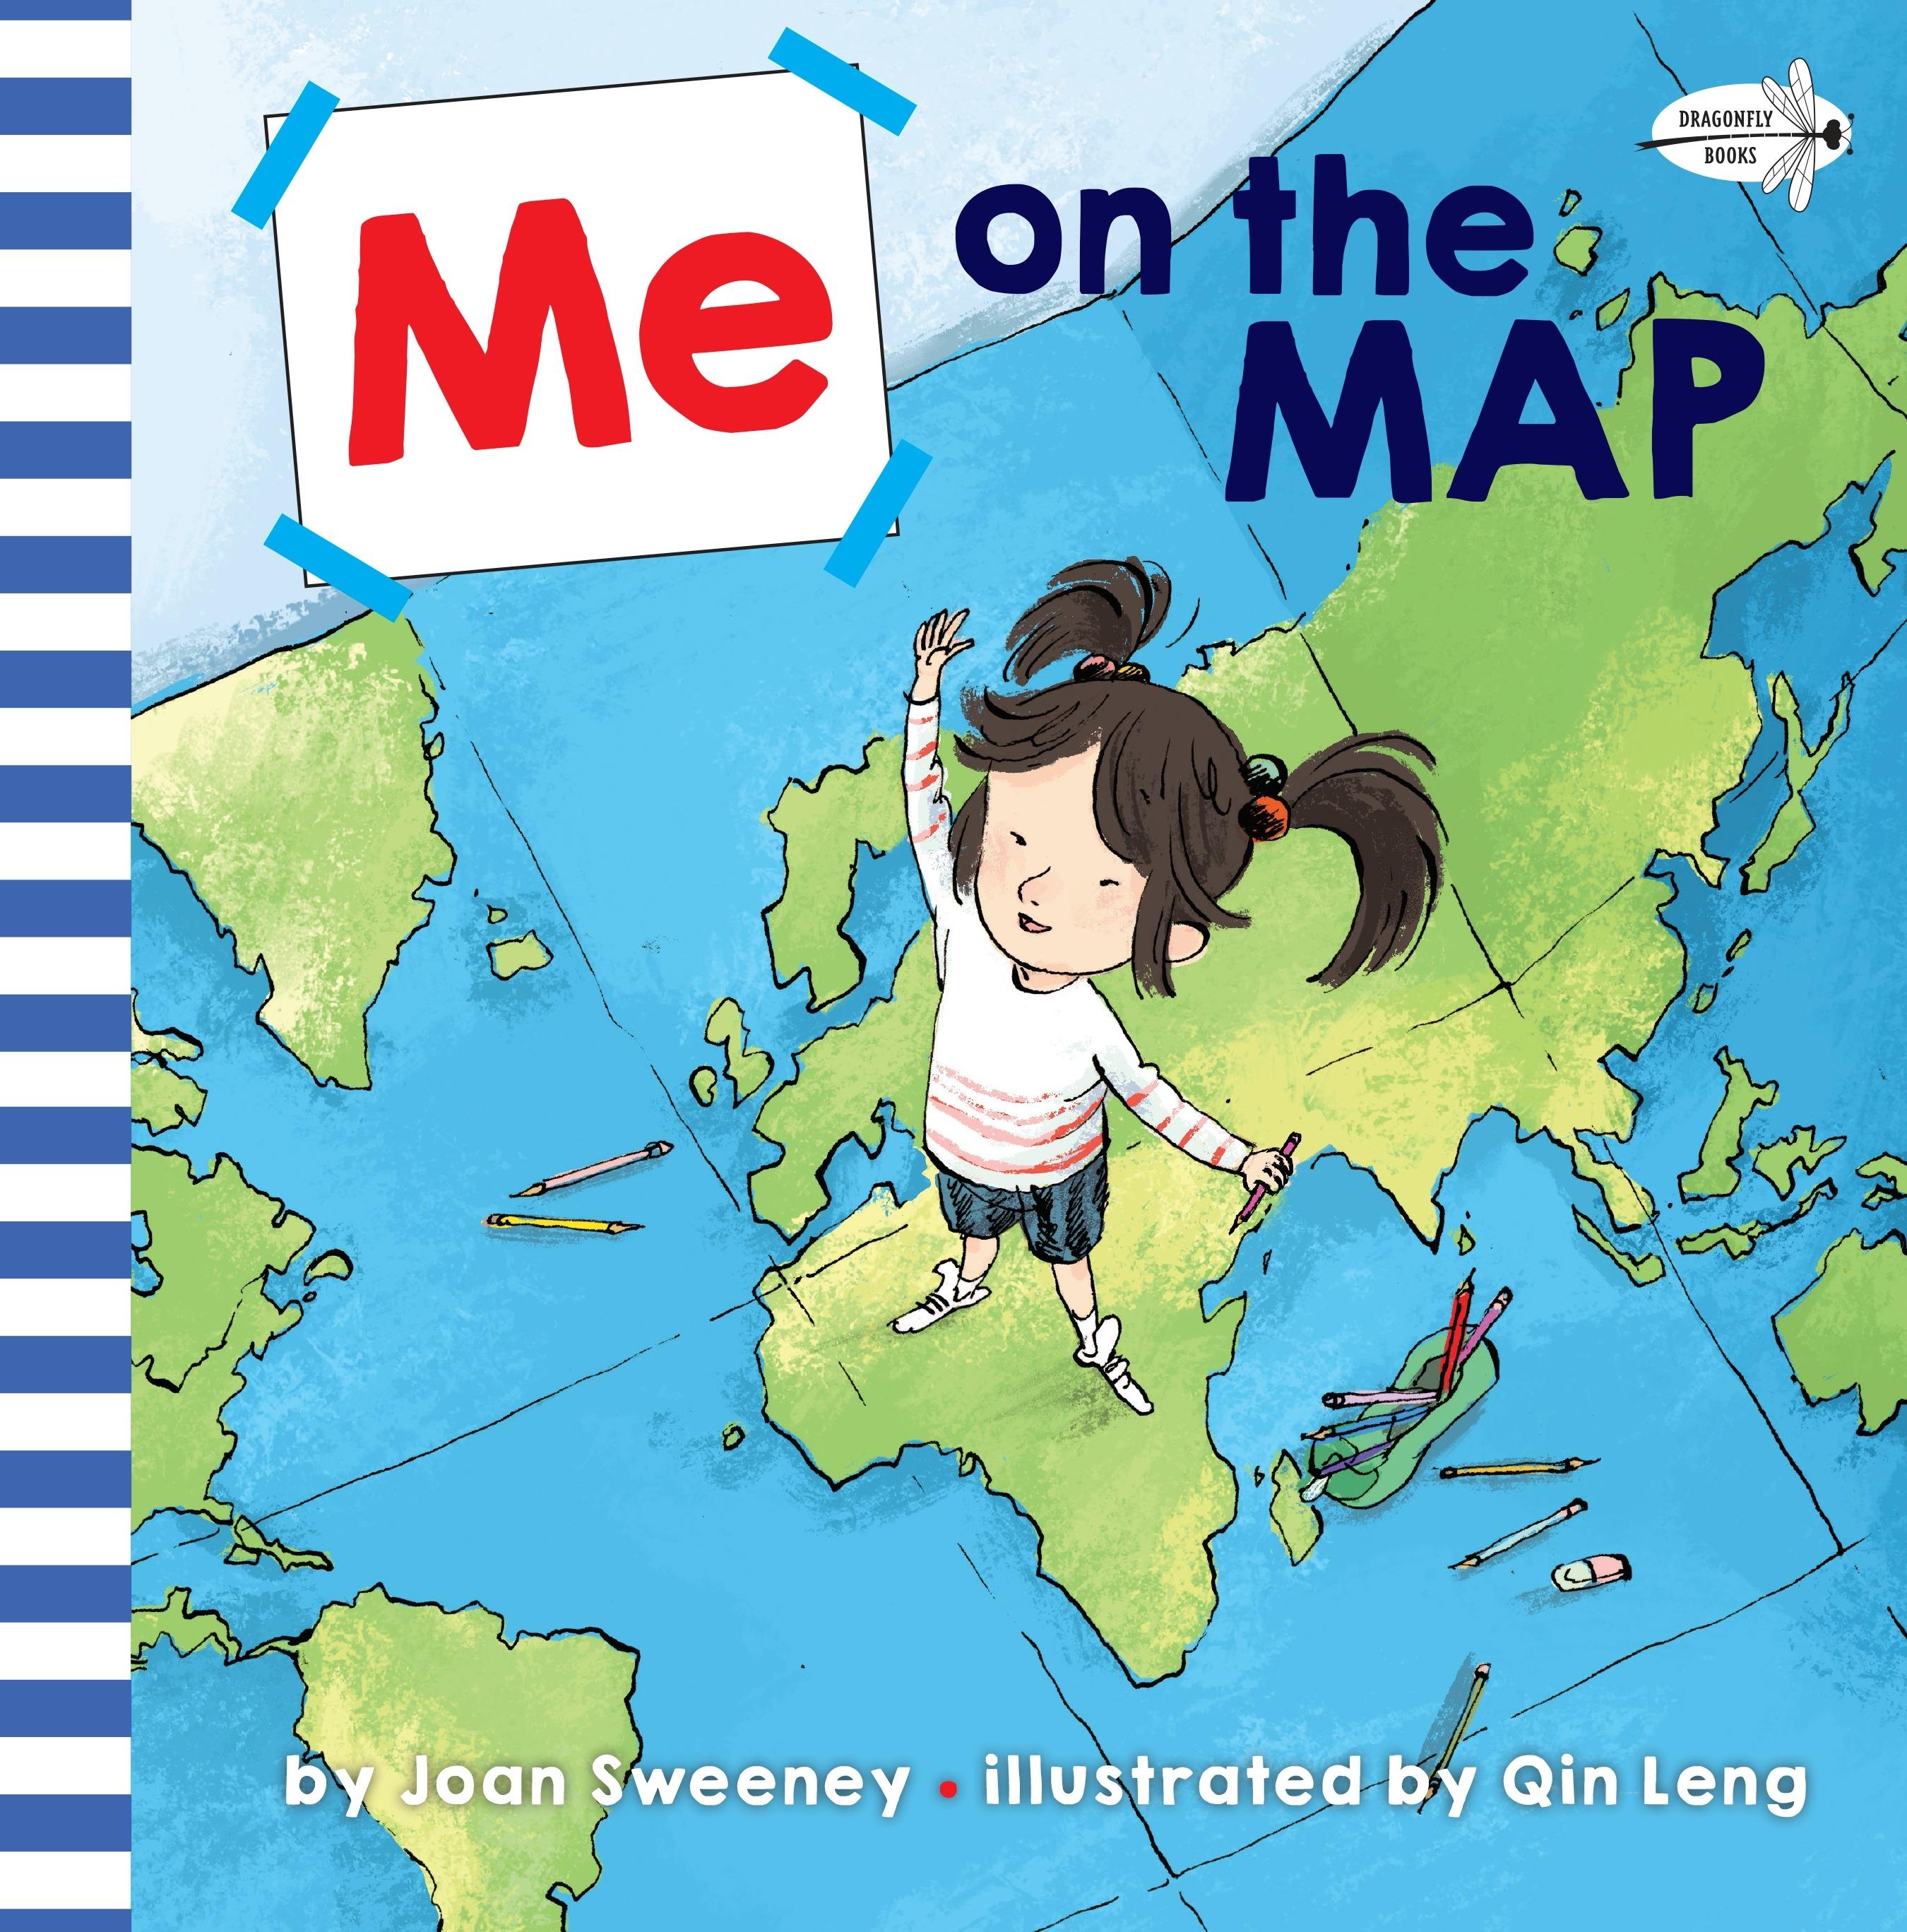 The Map Australia.Me On The Map By Joan Sweeney Penguin Books Australia